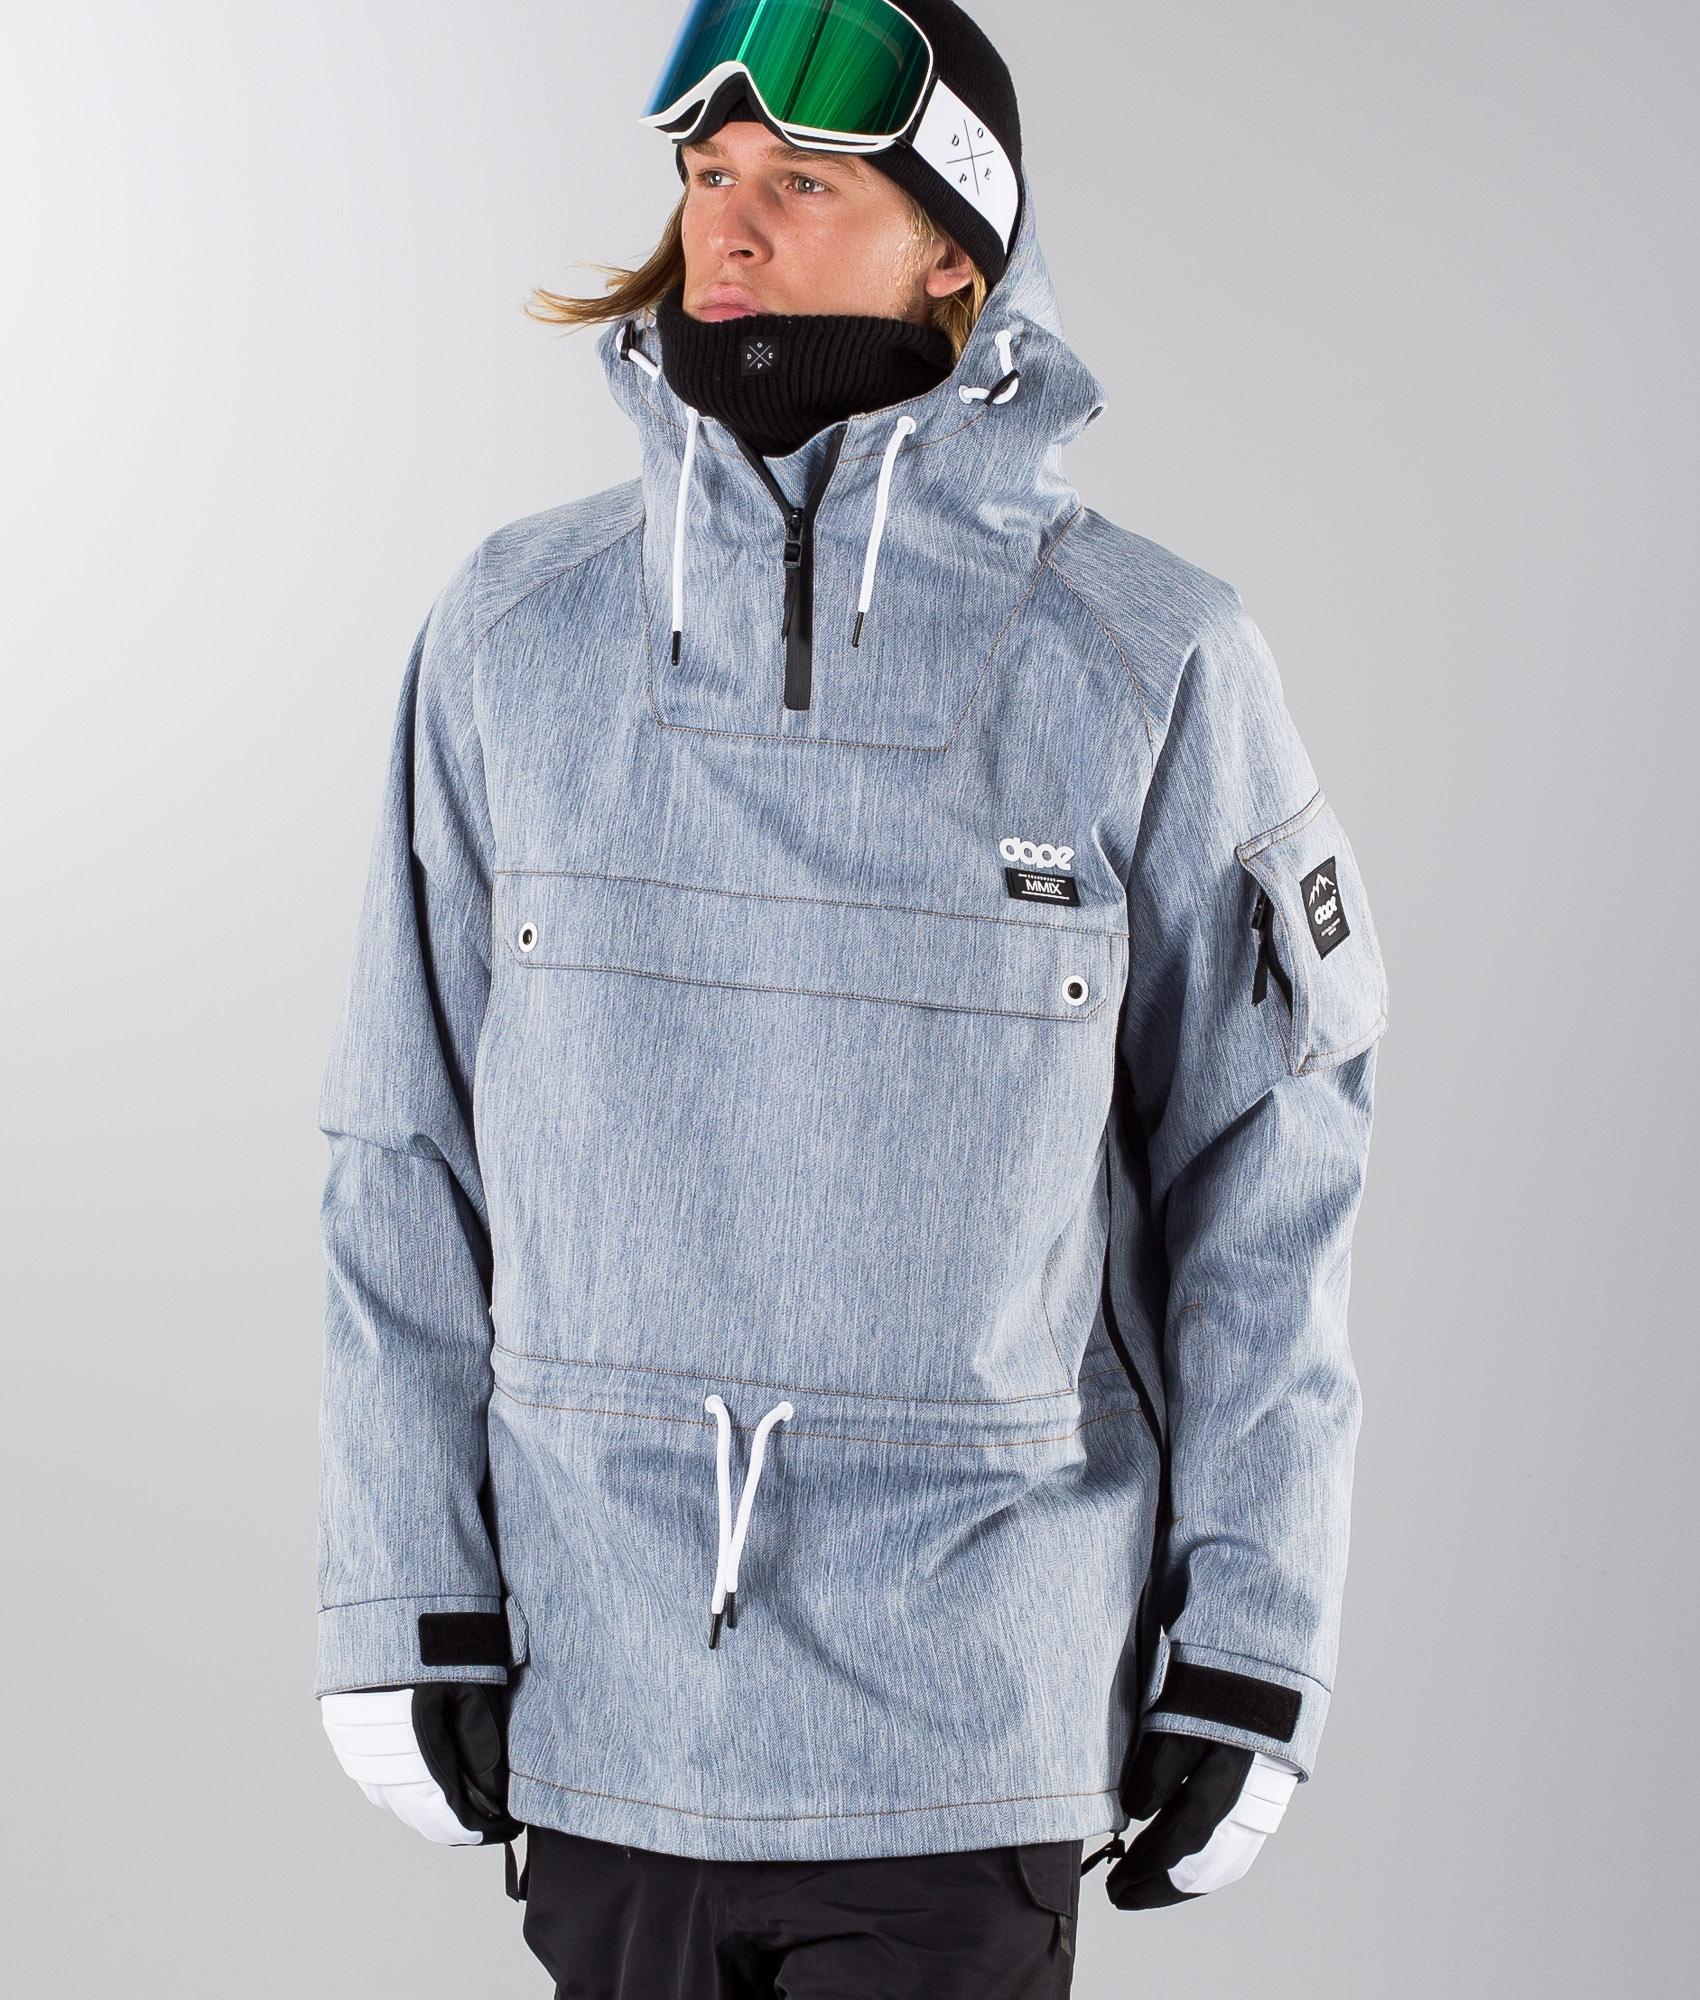 dope snow jacke mit jeans